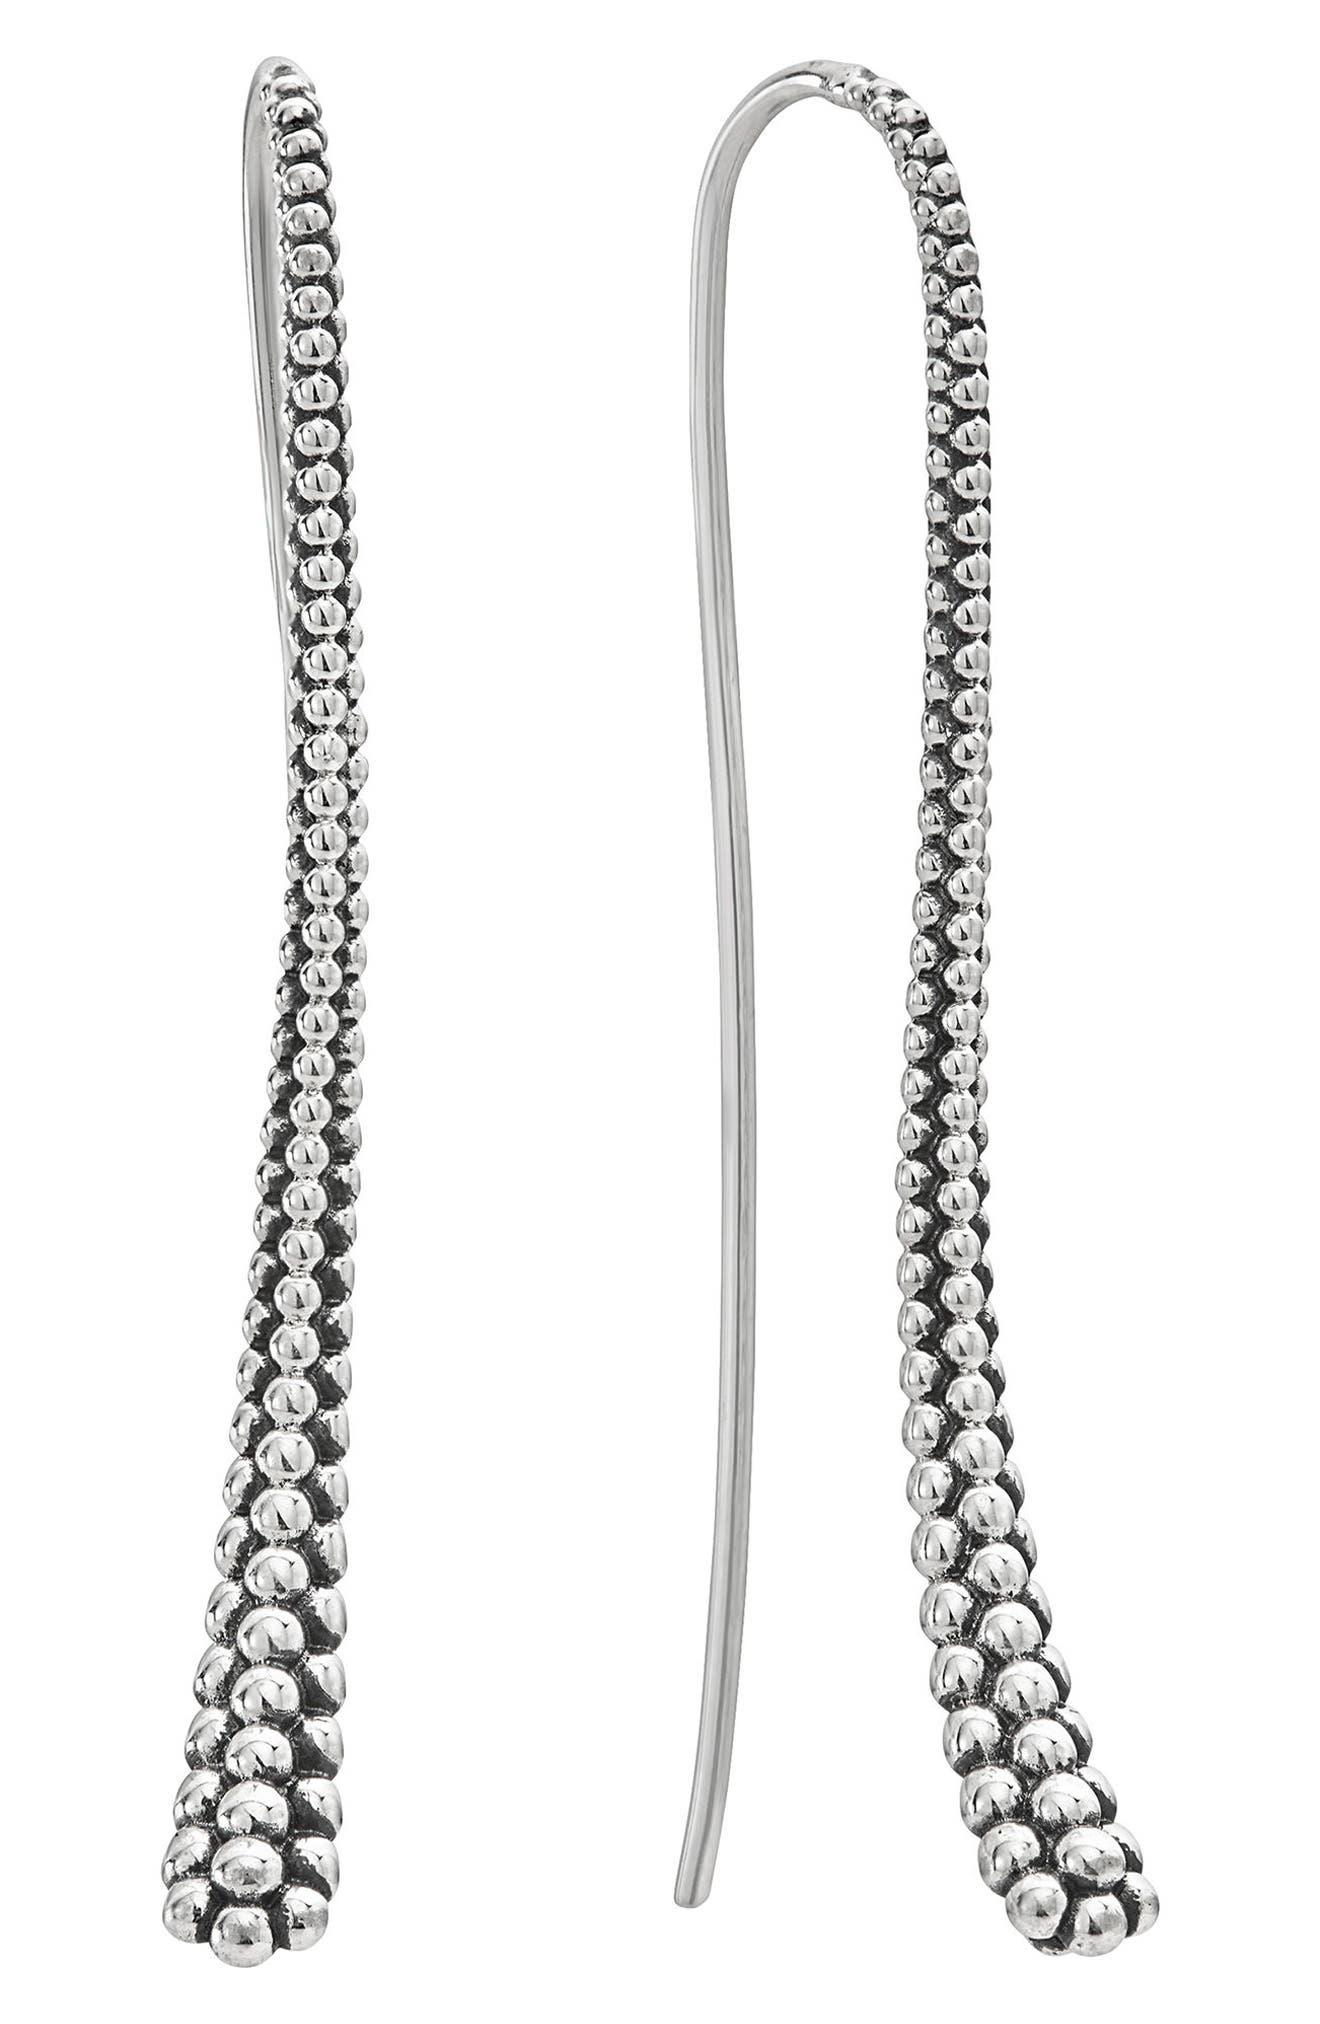 Caviar Linear Earrings,                         Main,                         color, Silver